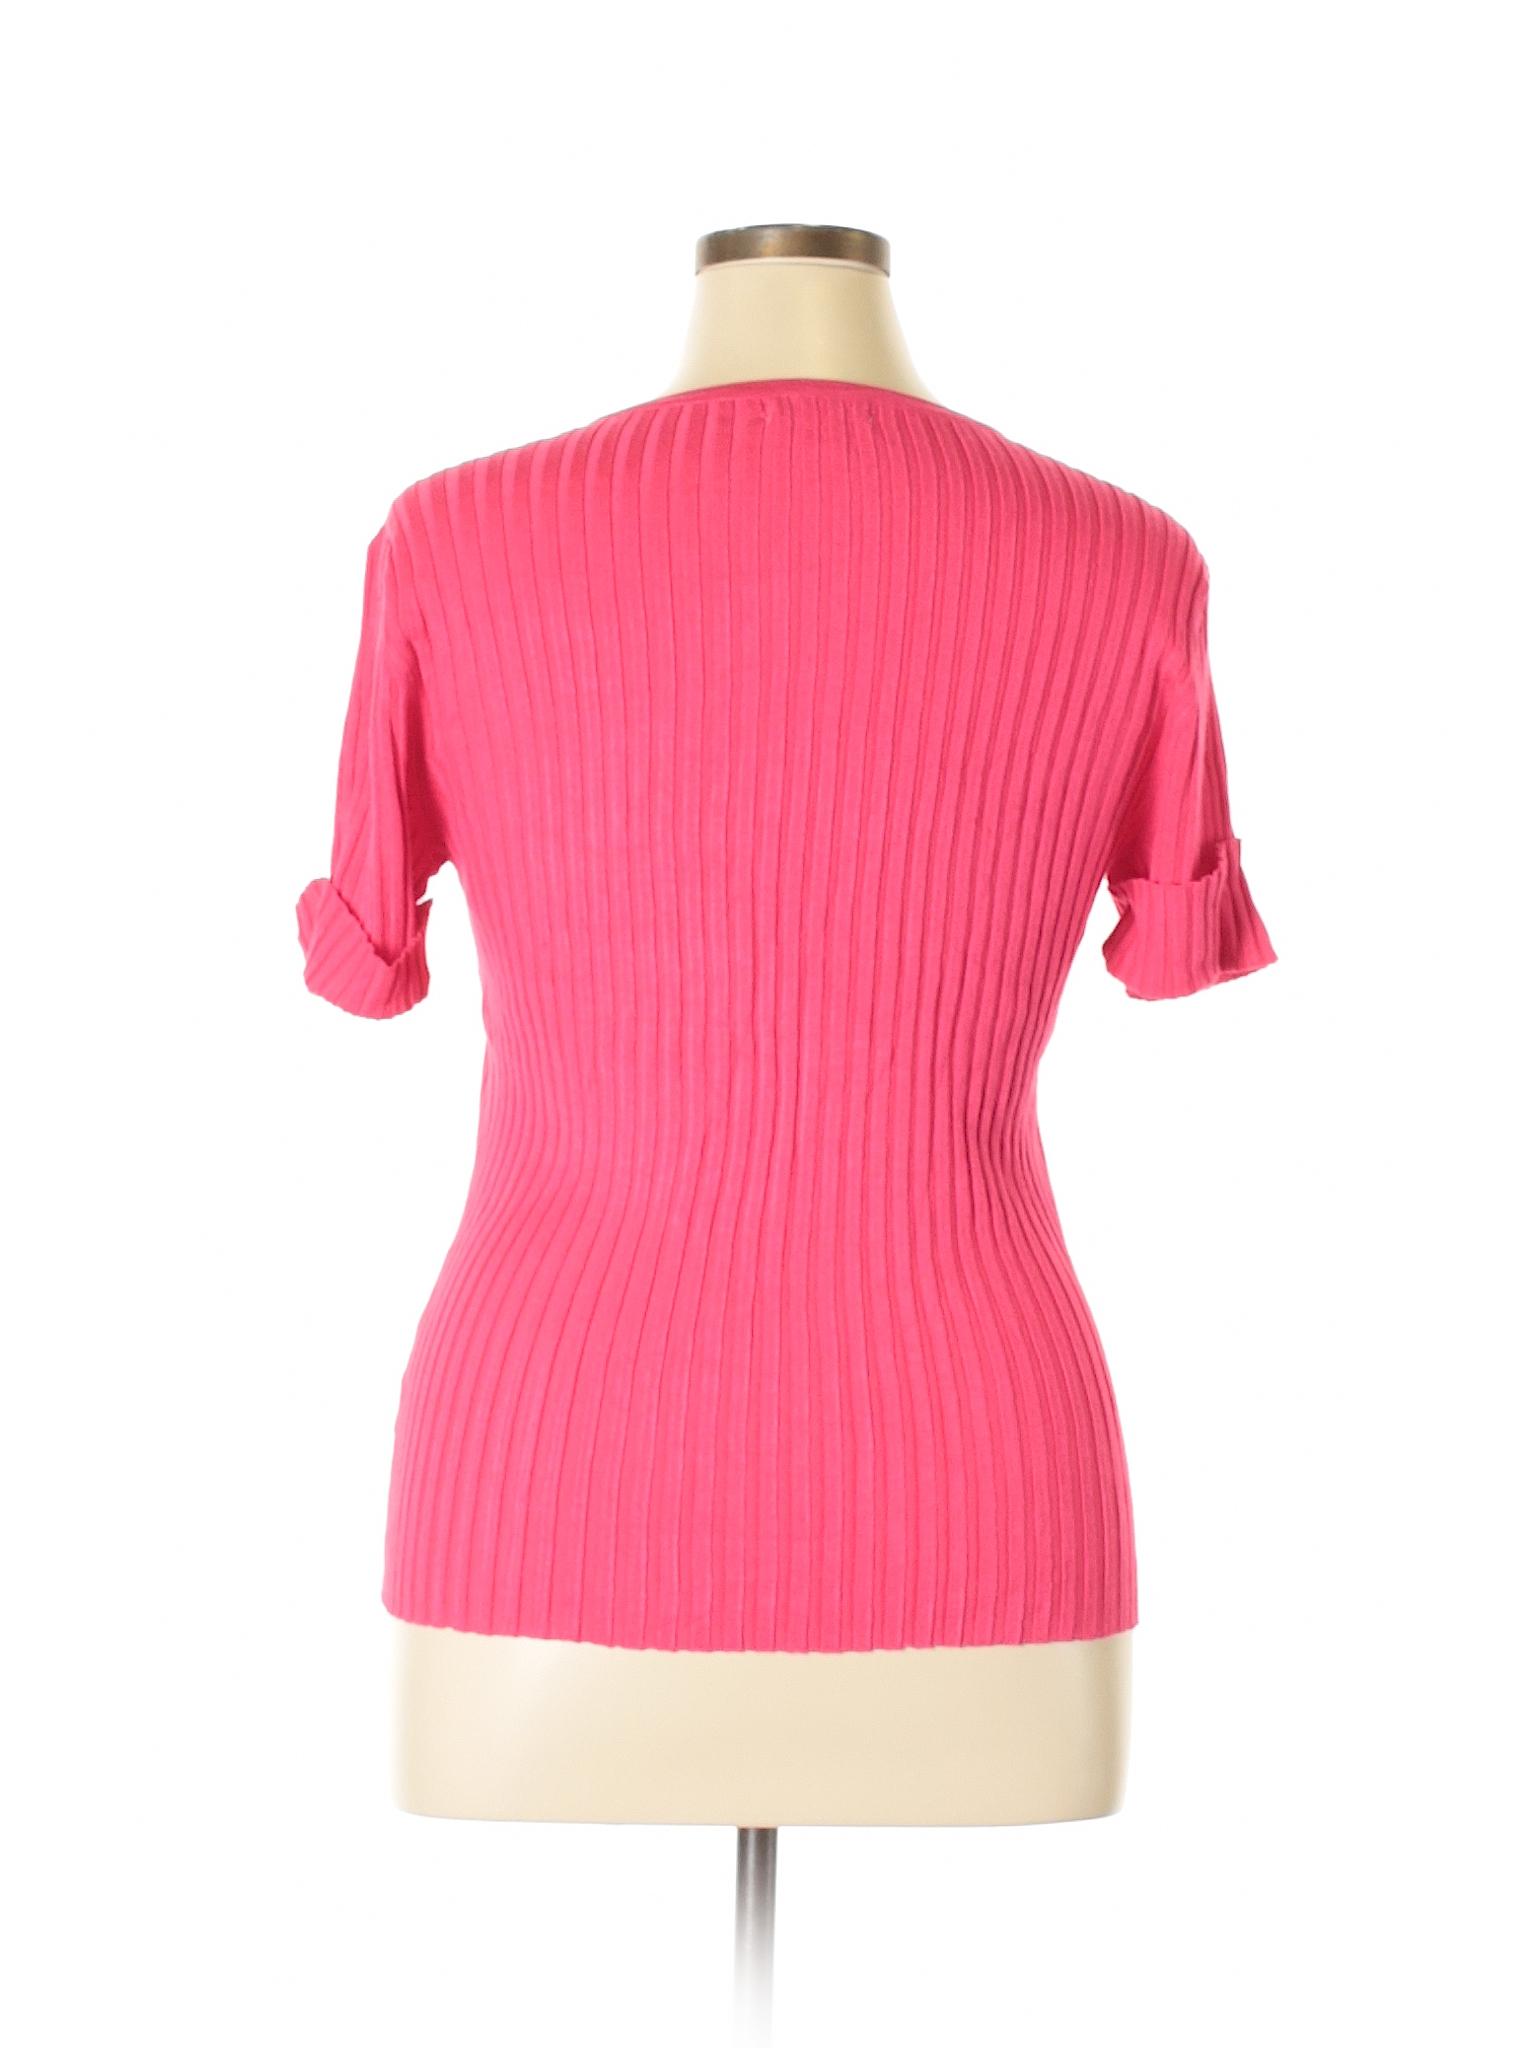 Boutique Sweater Pullover New Boutique Balance New vqwPX5